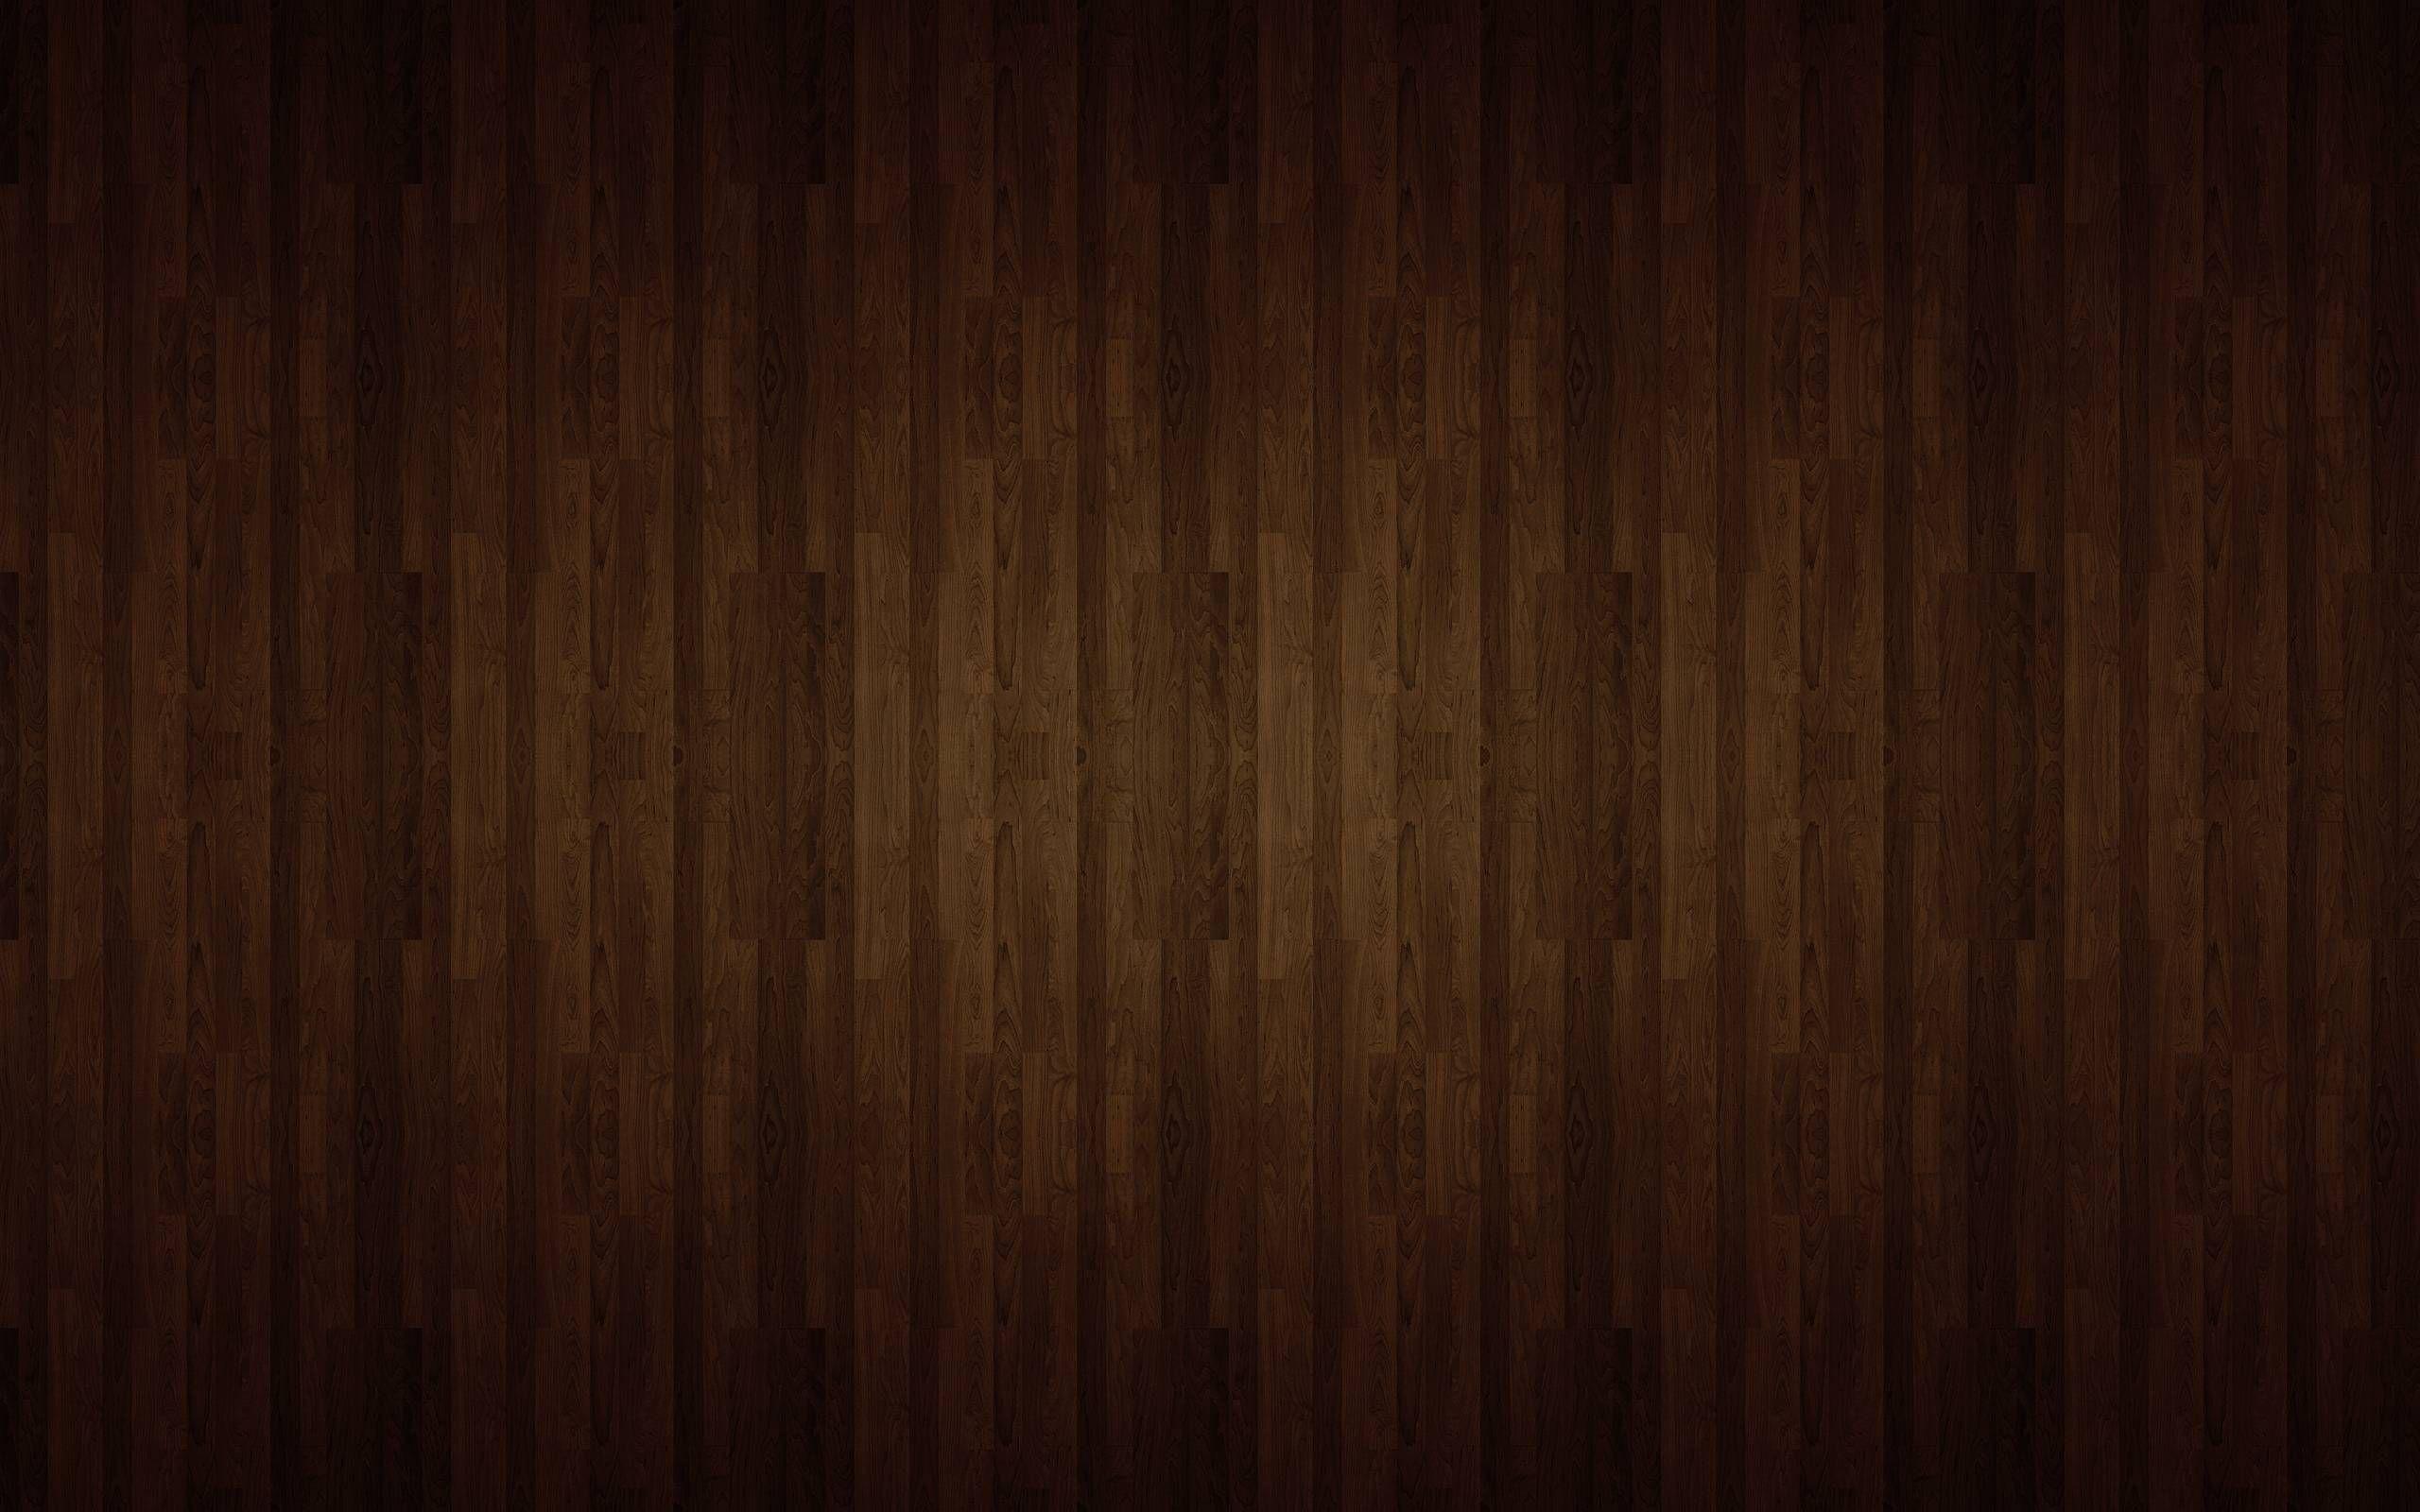 Hd Wood Backgrounds Wallpaper Wood Wallpaper Dark Wood Wallpaper Wood Pattern Wallpaper